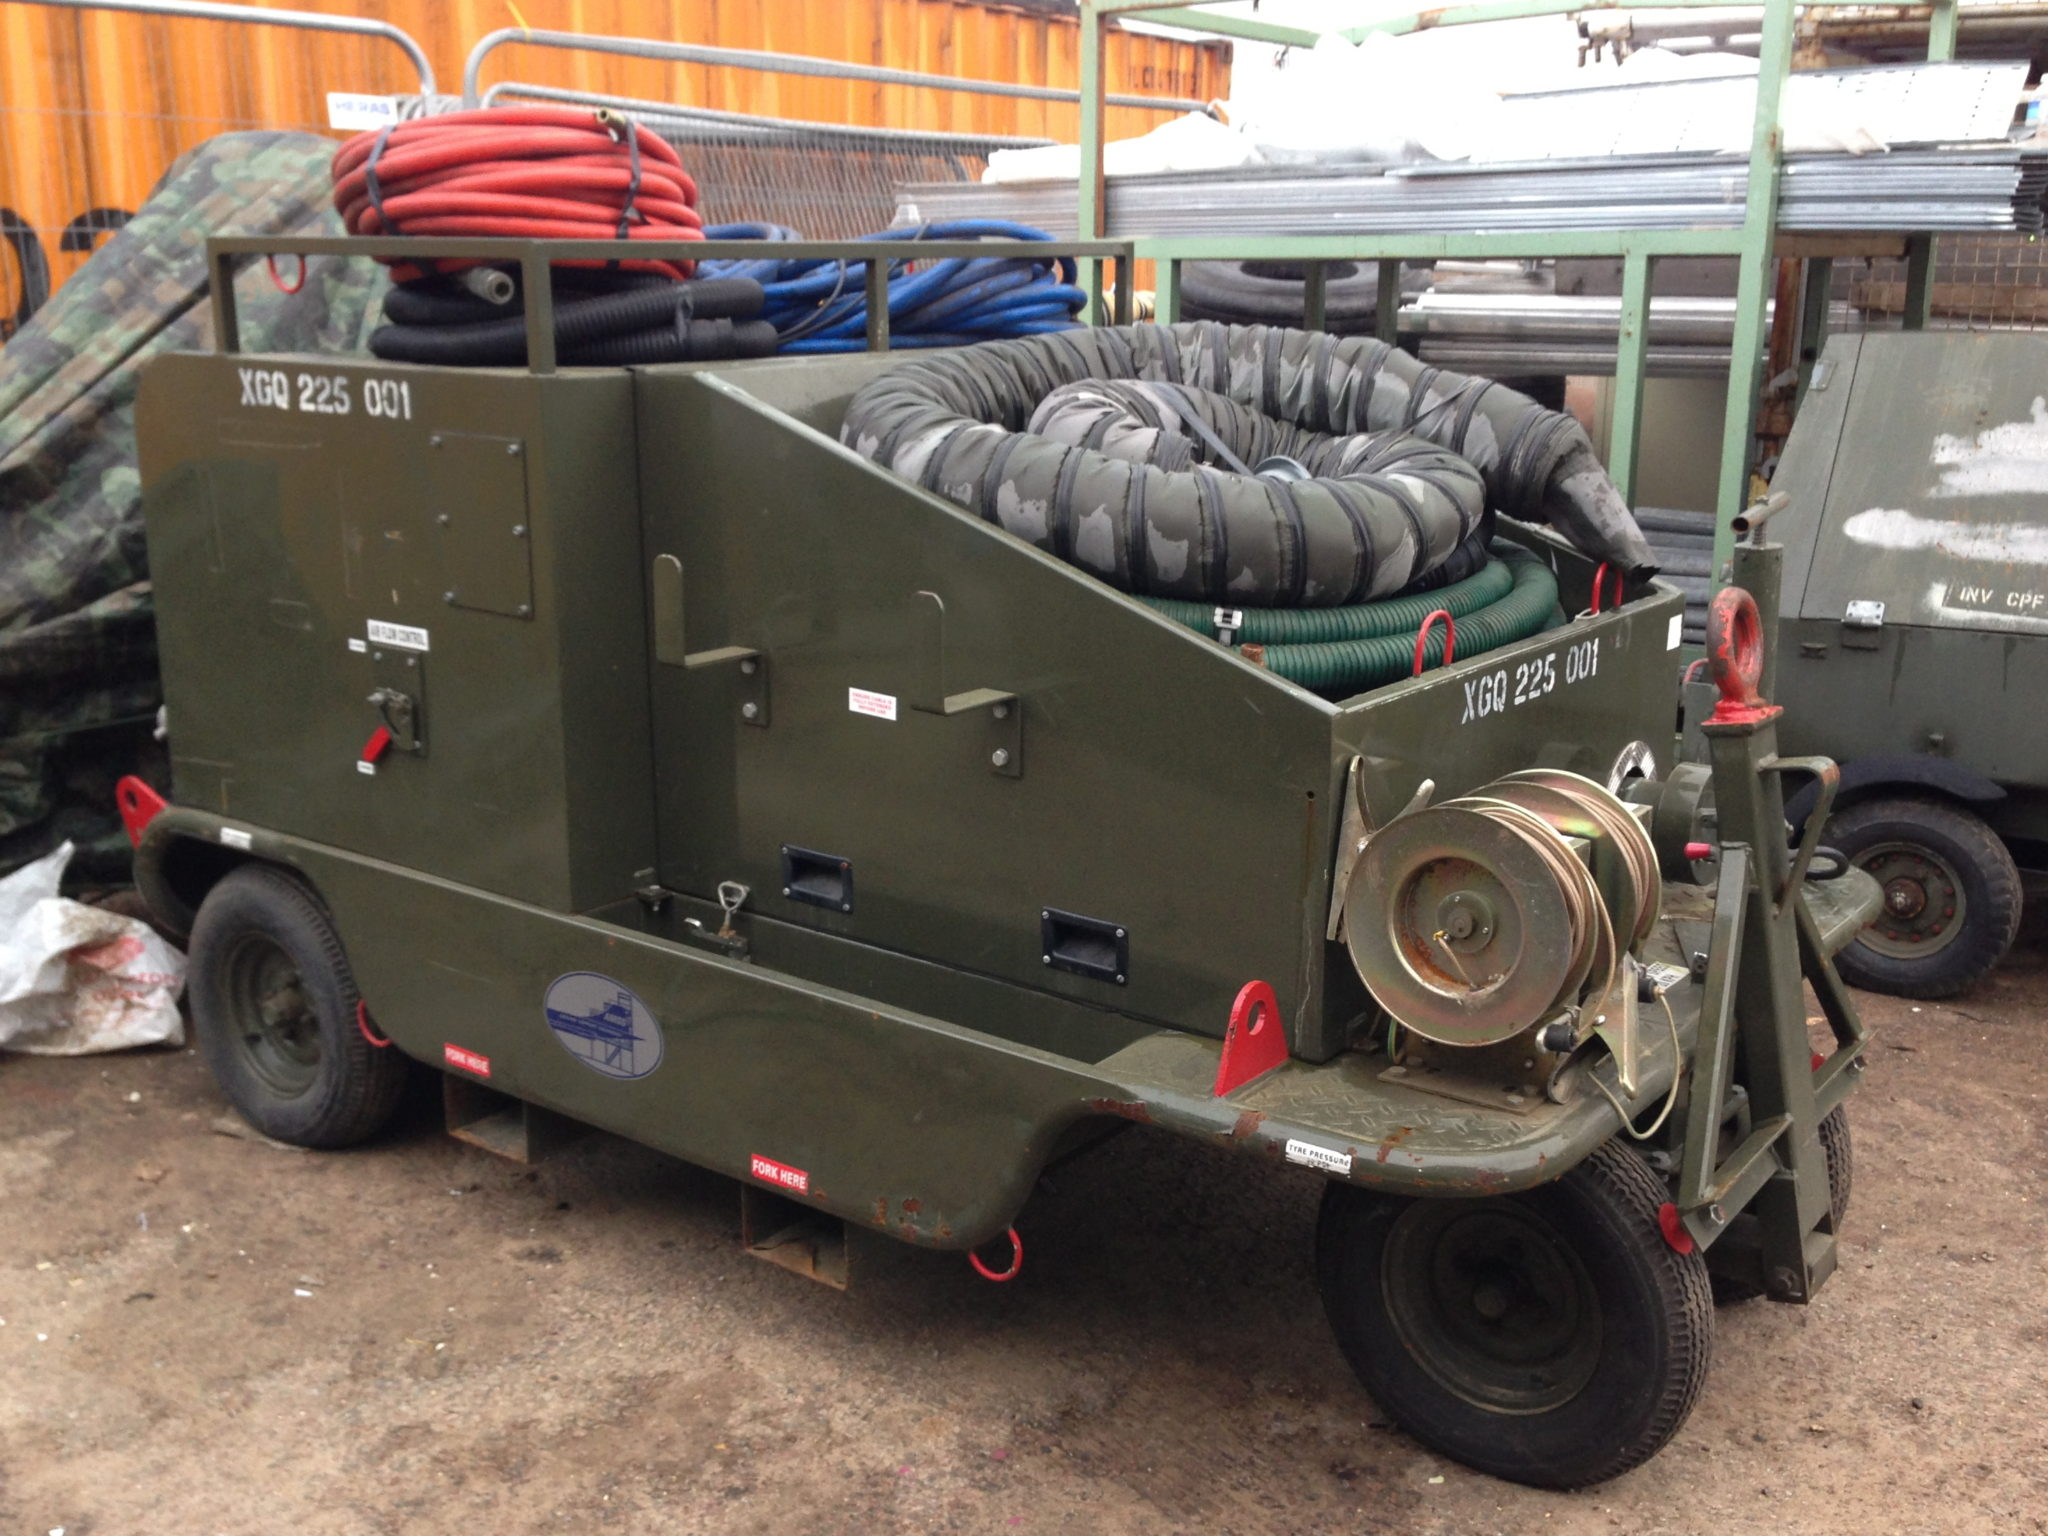 Aircraft Fuel Tank Maintenance Trolley 2 Available - Aircraft Fuel Tank Maintenance Trolley